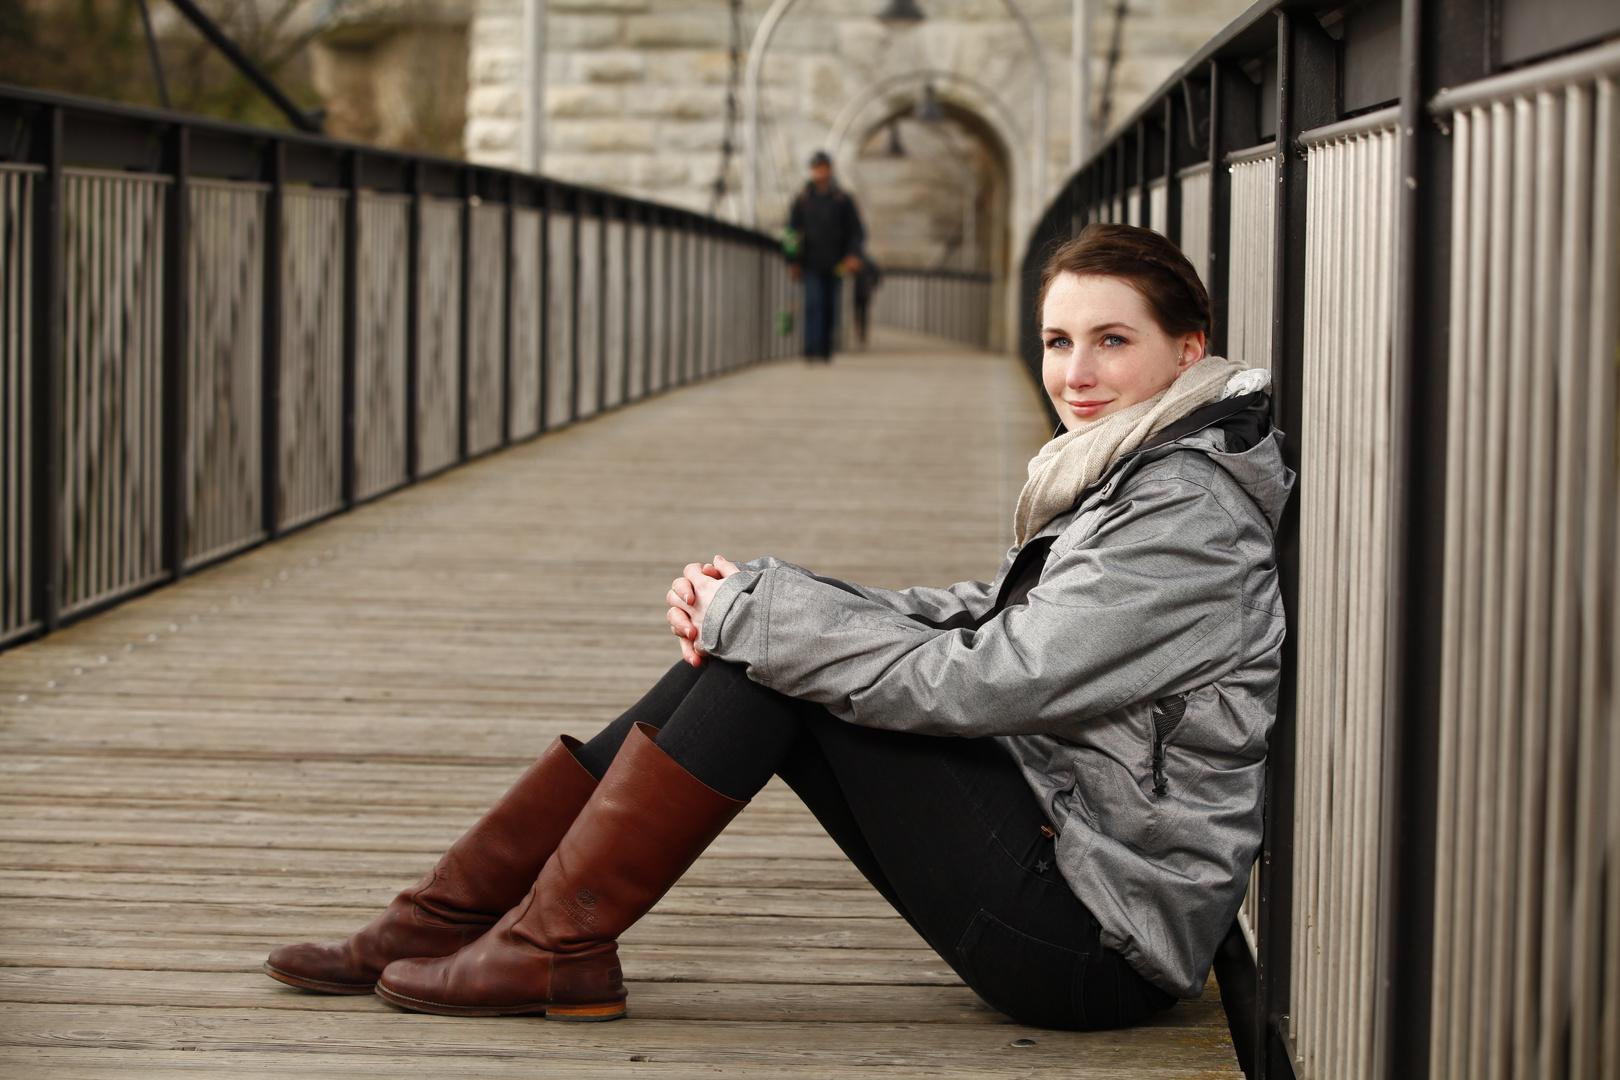 Anna Lisa auf der Brücke relaxed